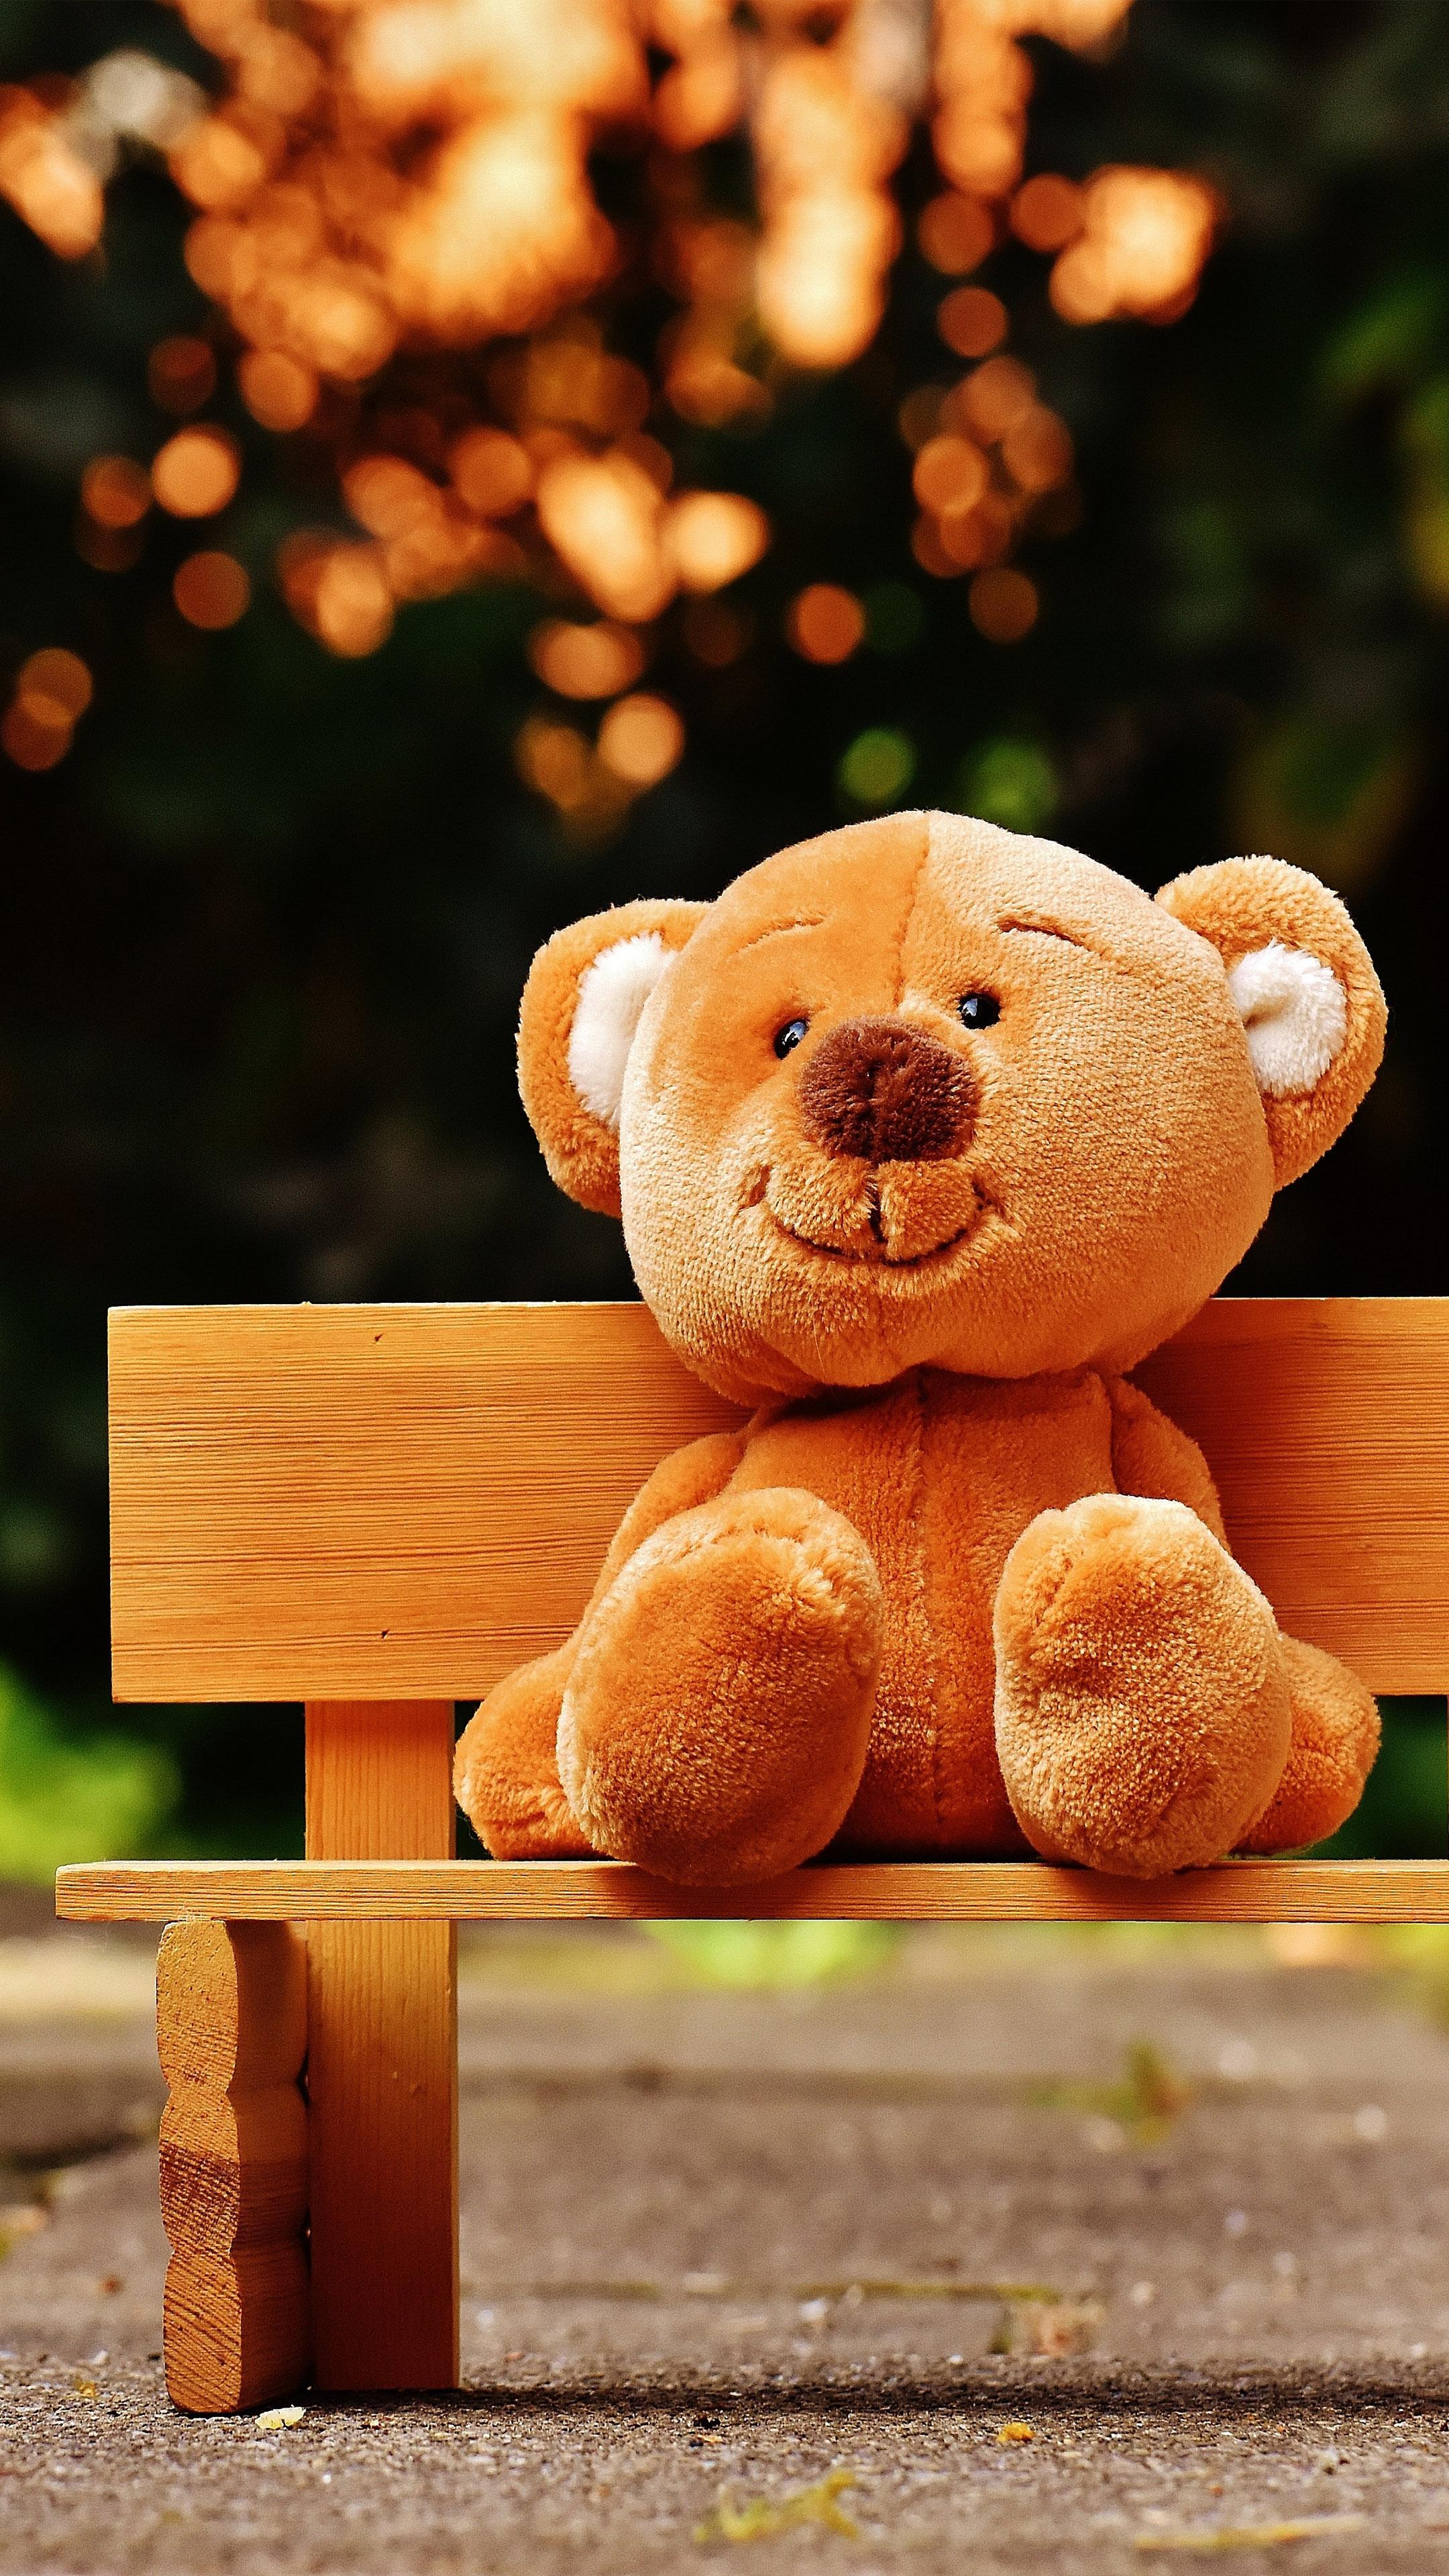 Cute Teddy Bear Park Bench 4k Ultra Hd Mobile Wallpaper